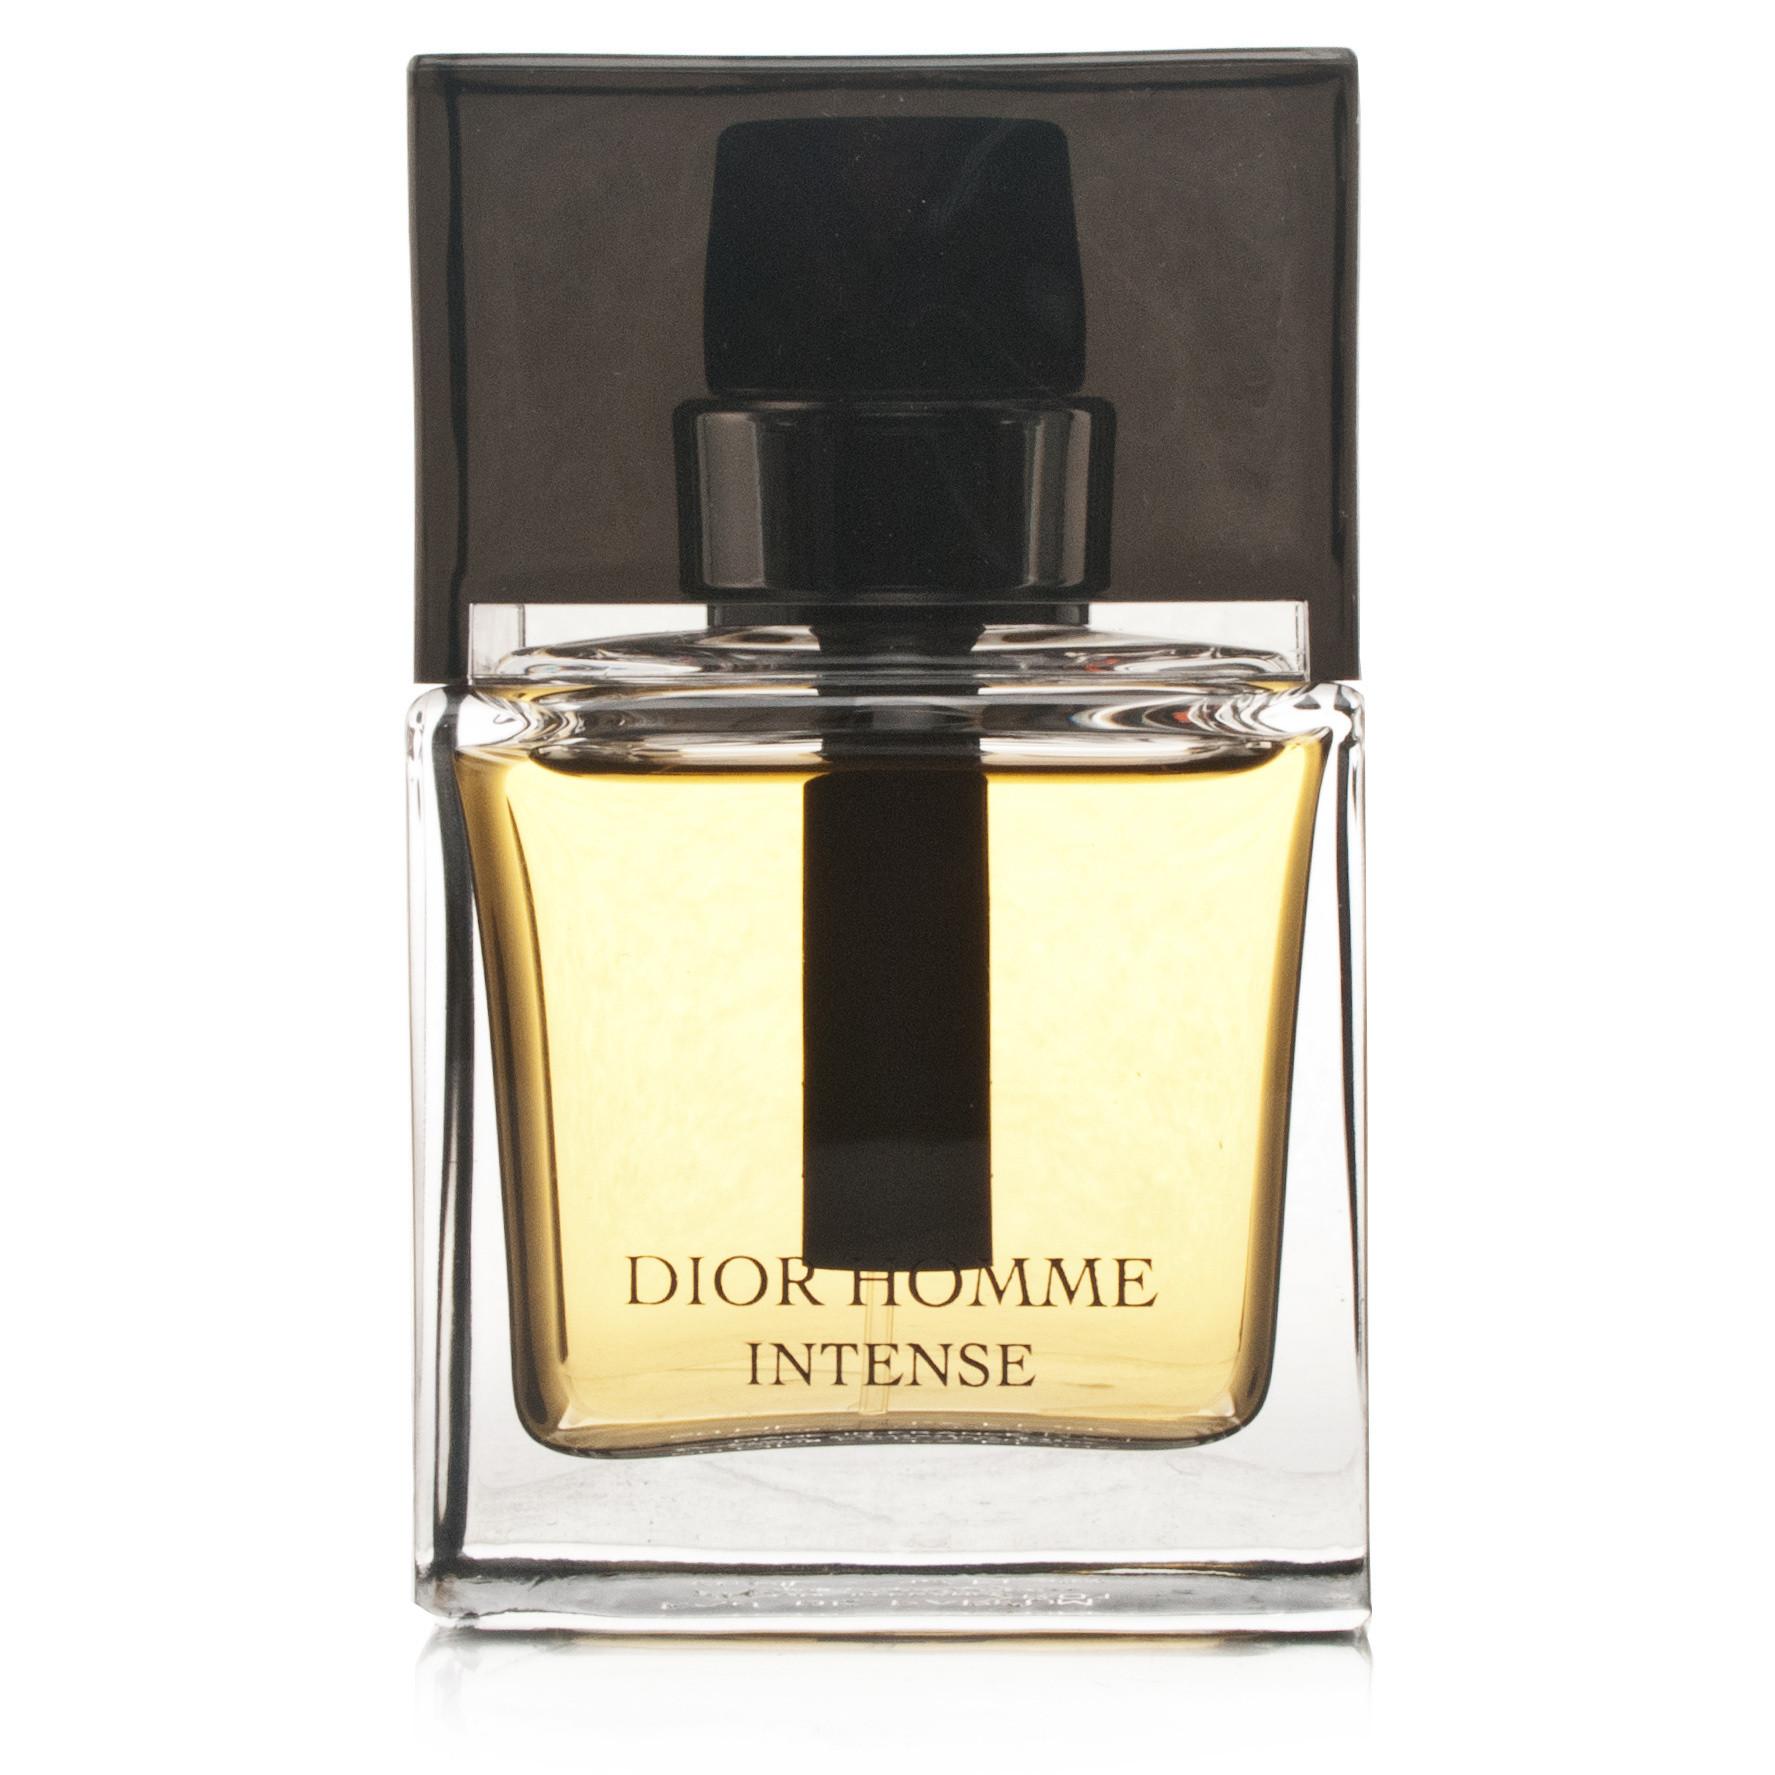 dior homme eau de parfum perfume fragrance product. Black Bedroom Furniture Sets. Home Design Ideas